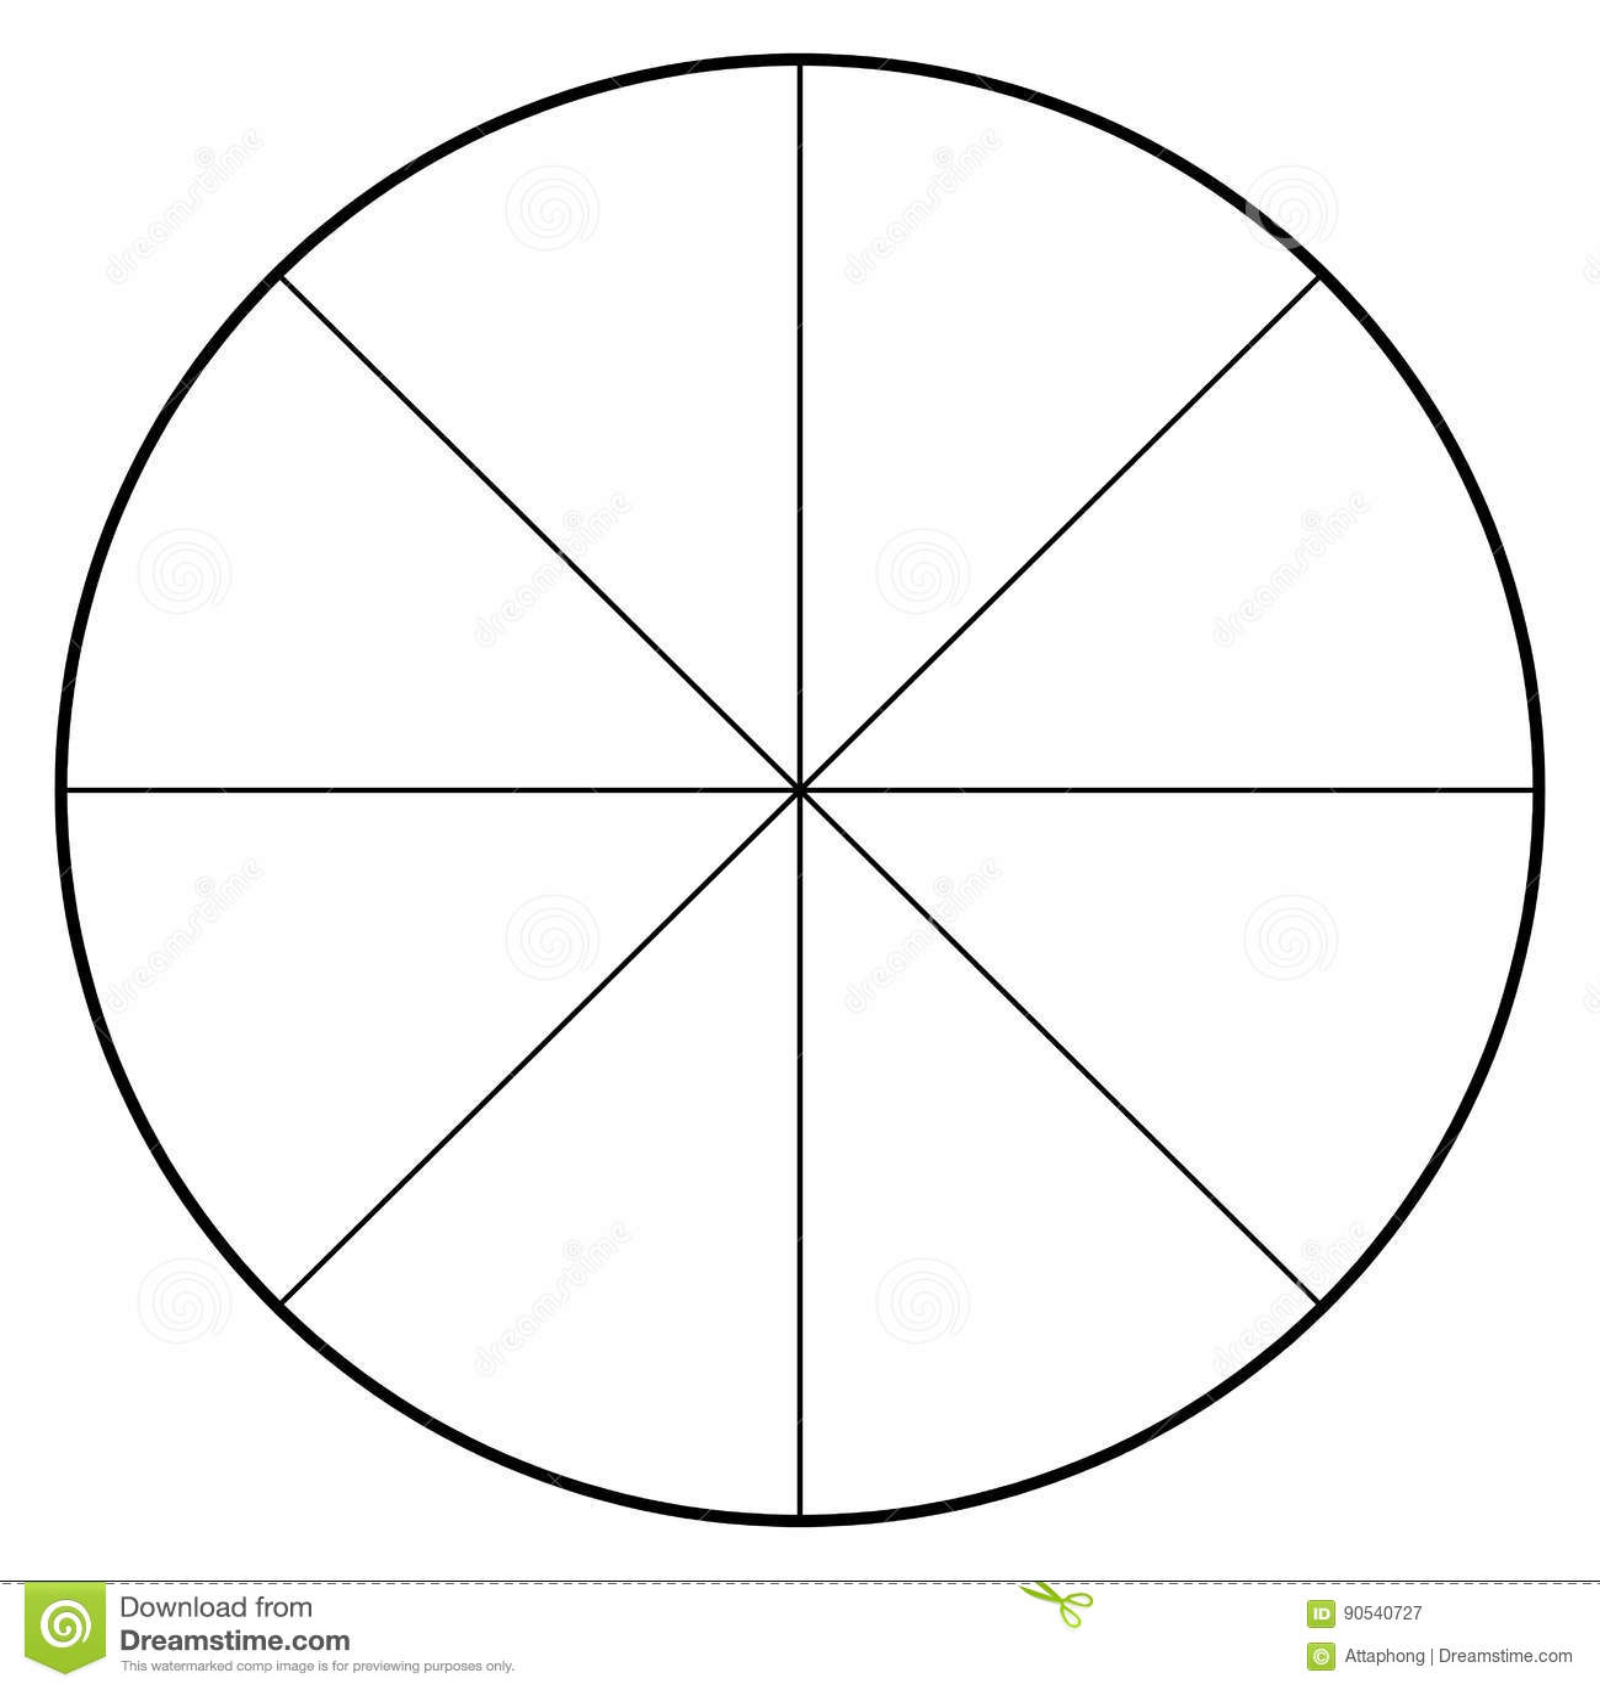 Blank pie chart pertamini co